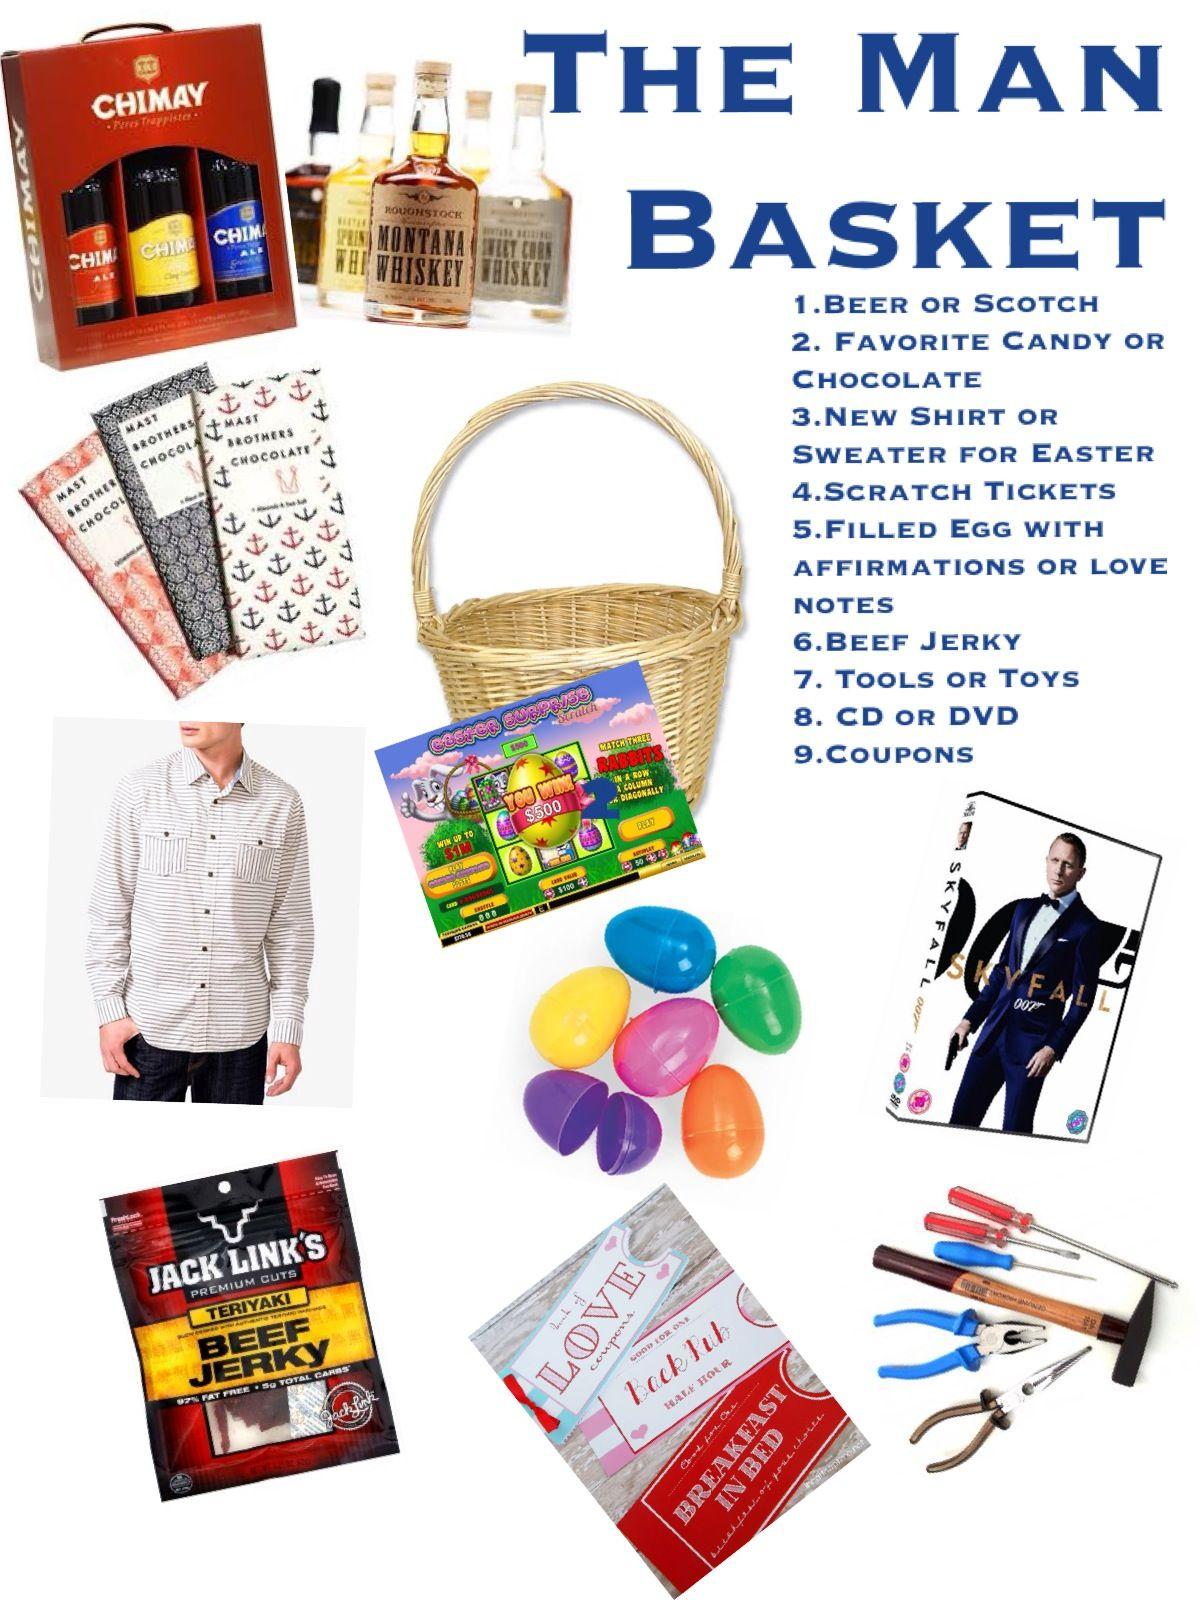 Man basketg 12001600 pixels easter pinterest man basket cute ideas for a nice easter basket for stetson negle Choice Image